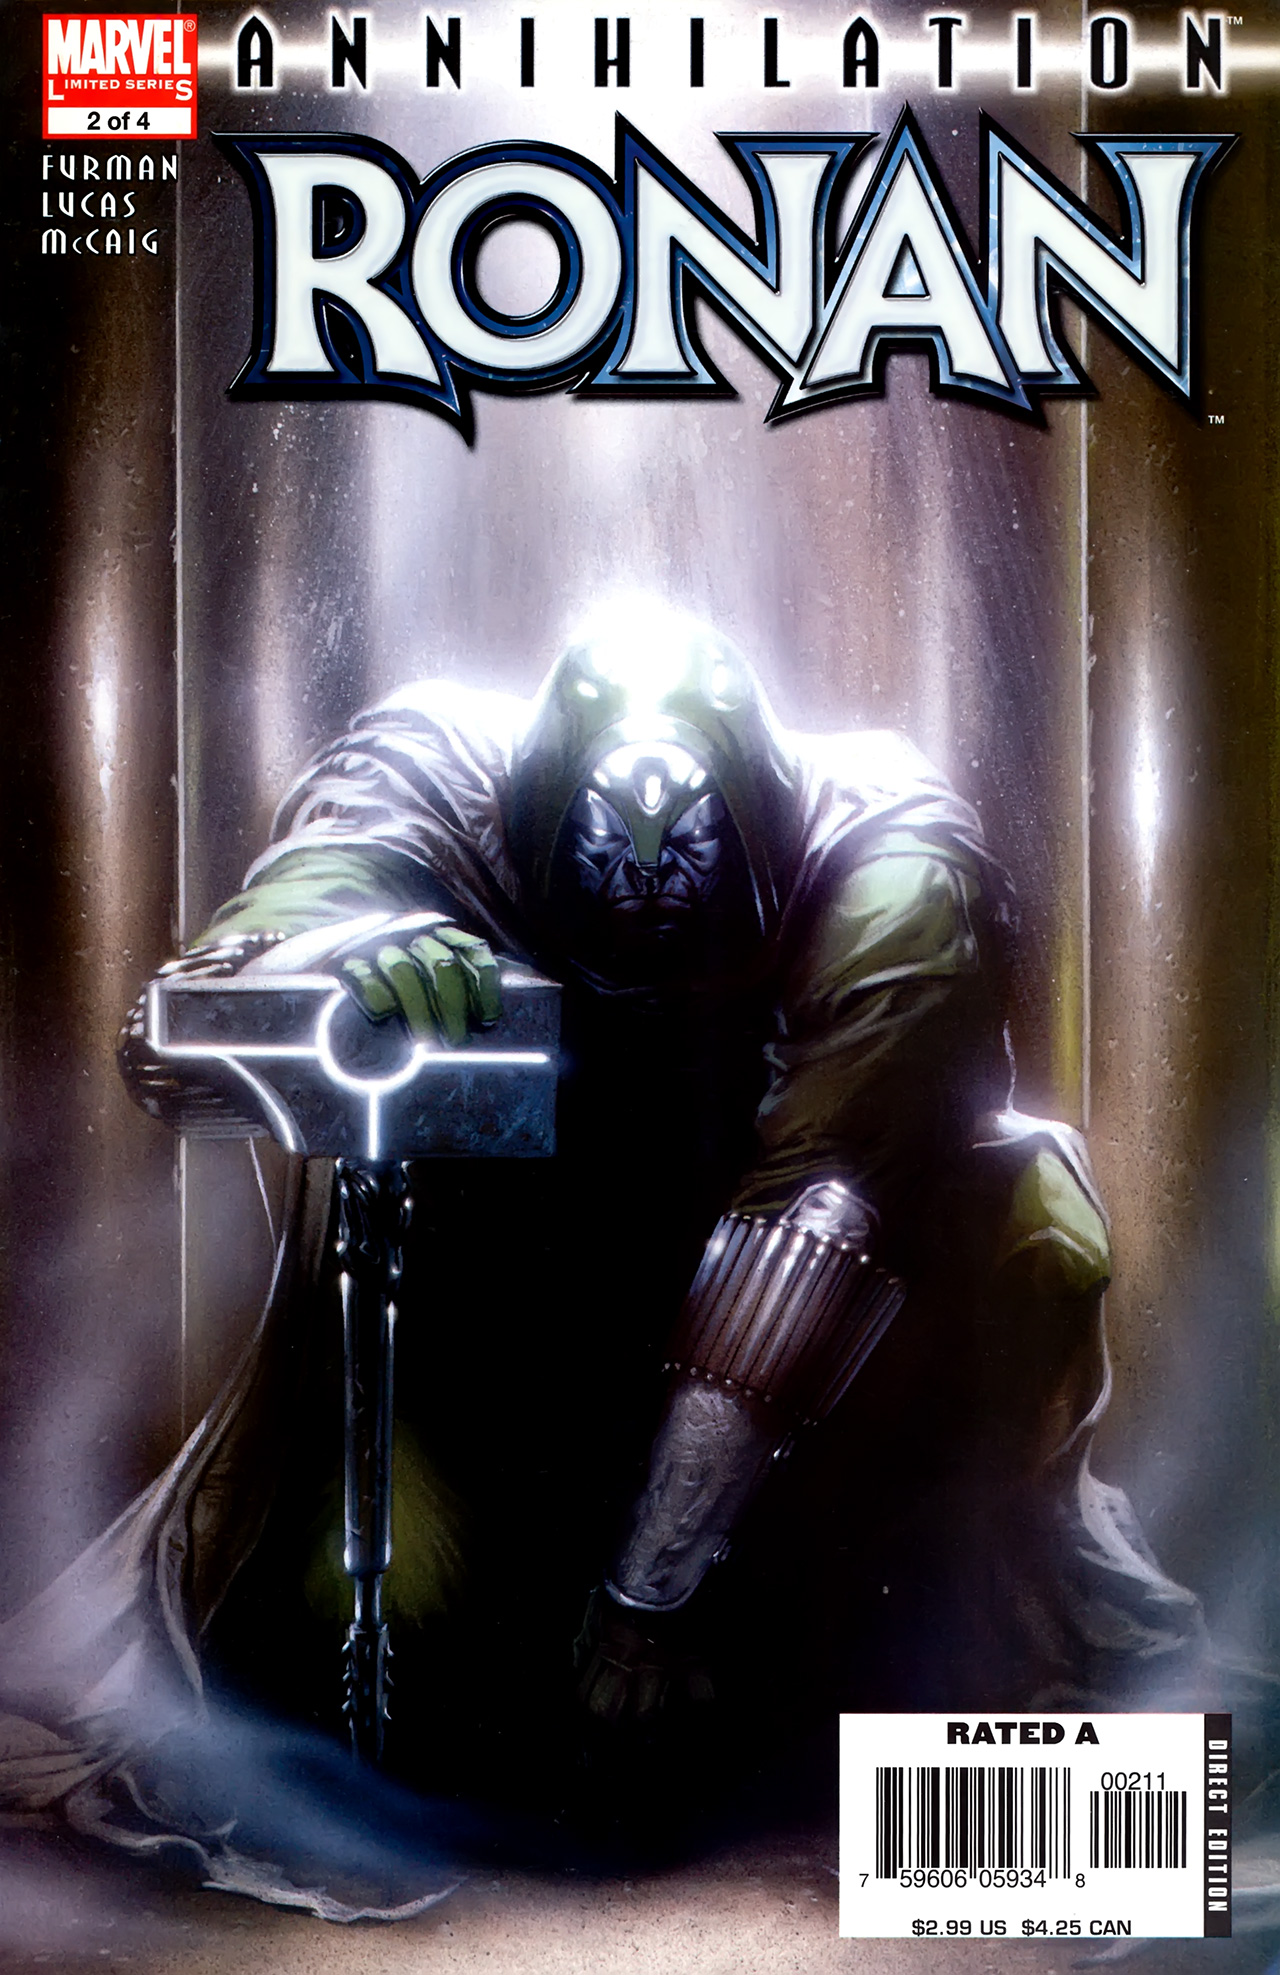 Read online Annihilation: Ronan comic -  Issue #2 - 1